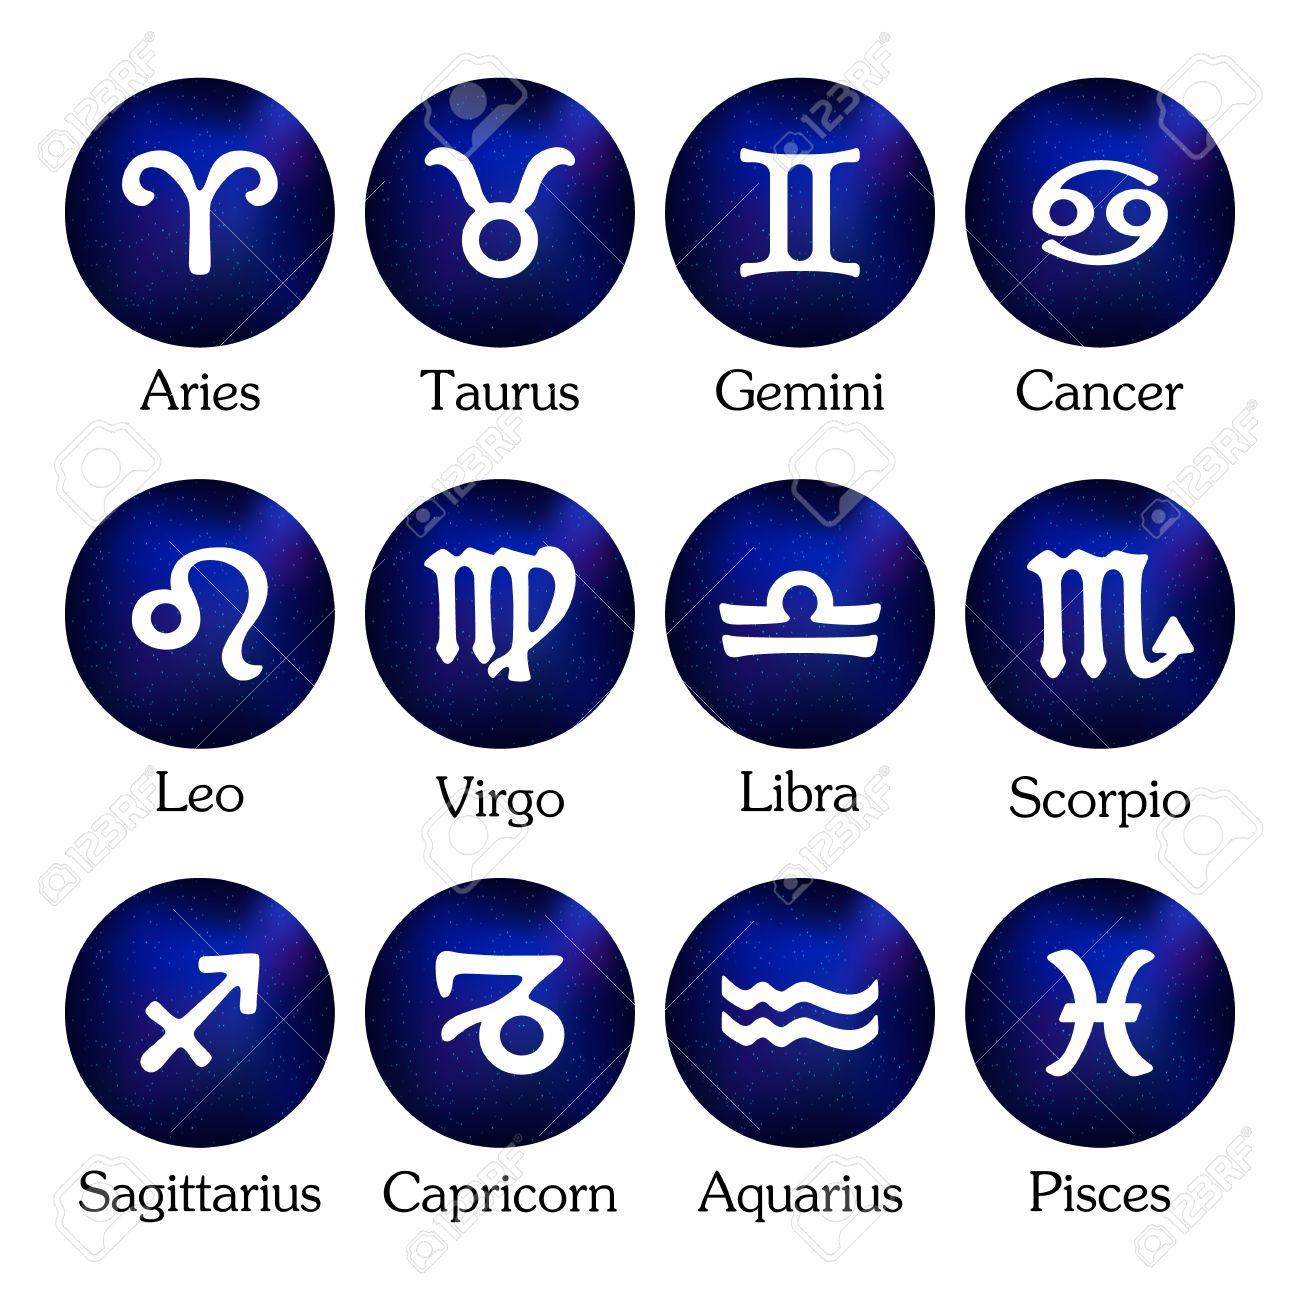 Zodiac icons horoscope set leo virgo scorpio libra aquarius zodiac icons horoscope set leo virgo scorpio libra aquarius biocorpaavc